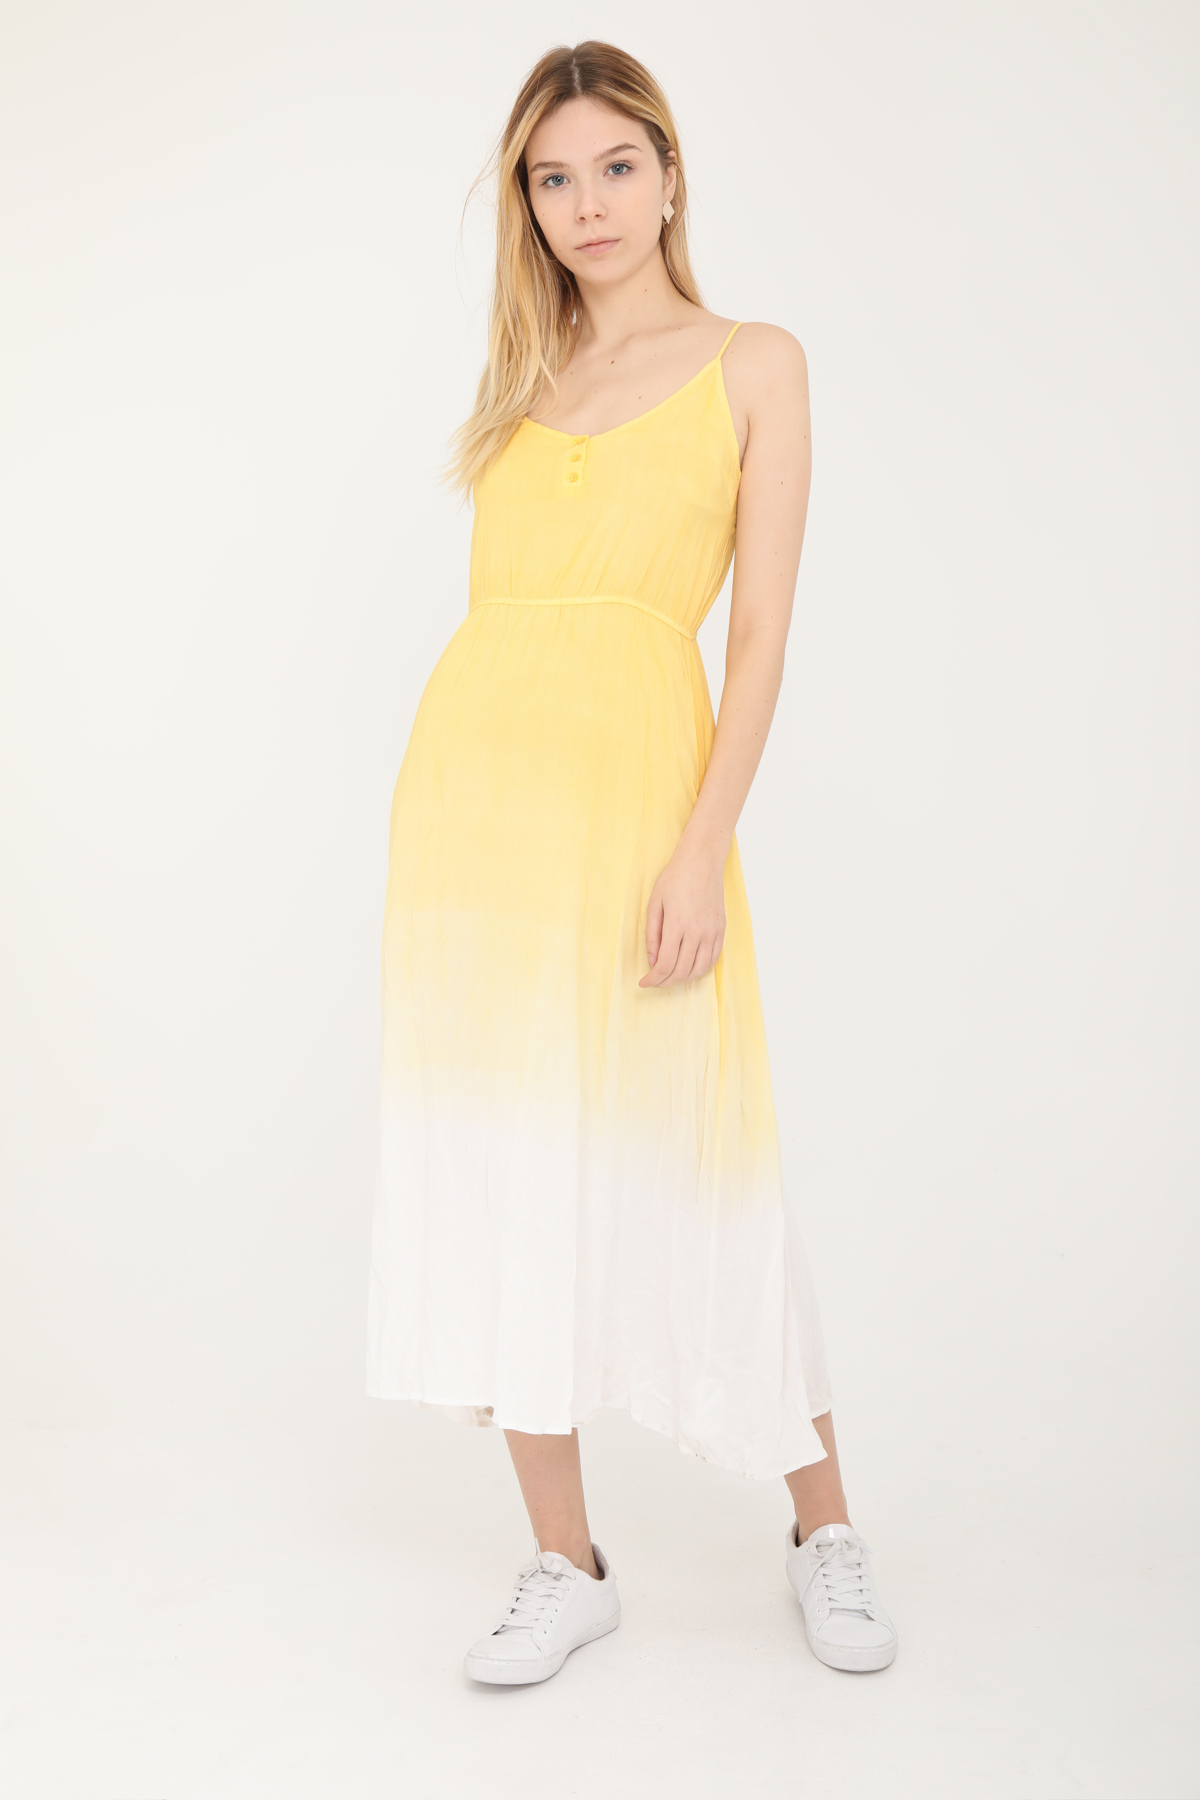 Robes longues Femme Moutarde SWEEWE 37124 #c eFashion Paris